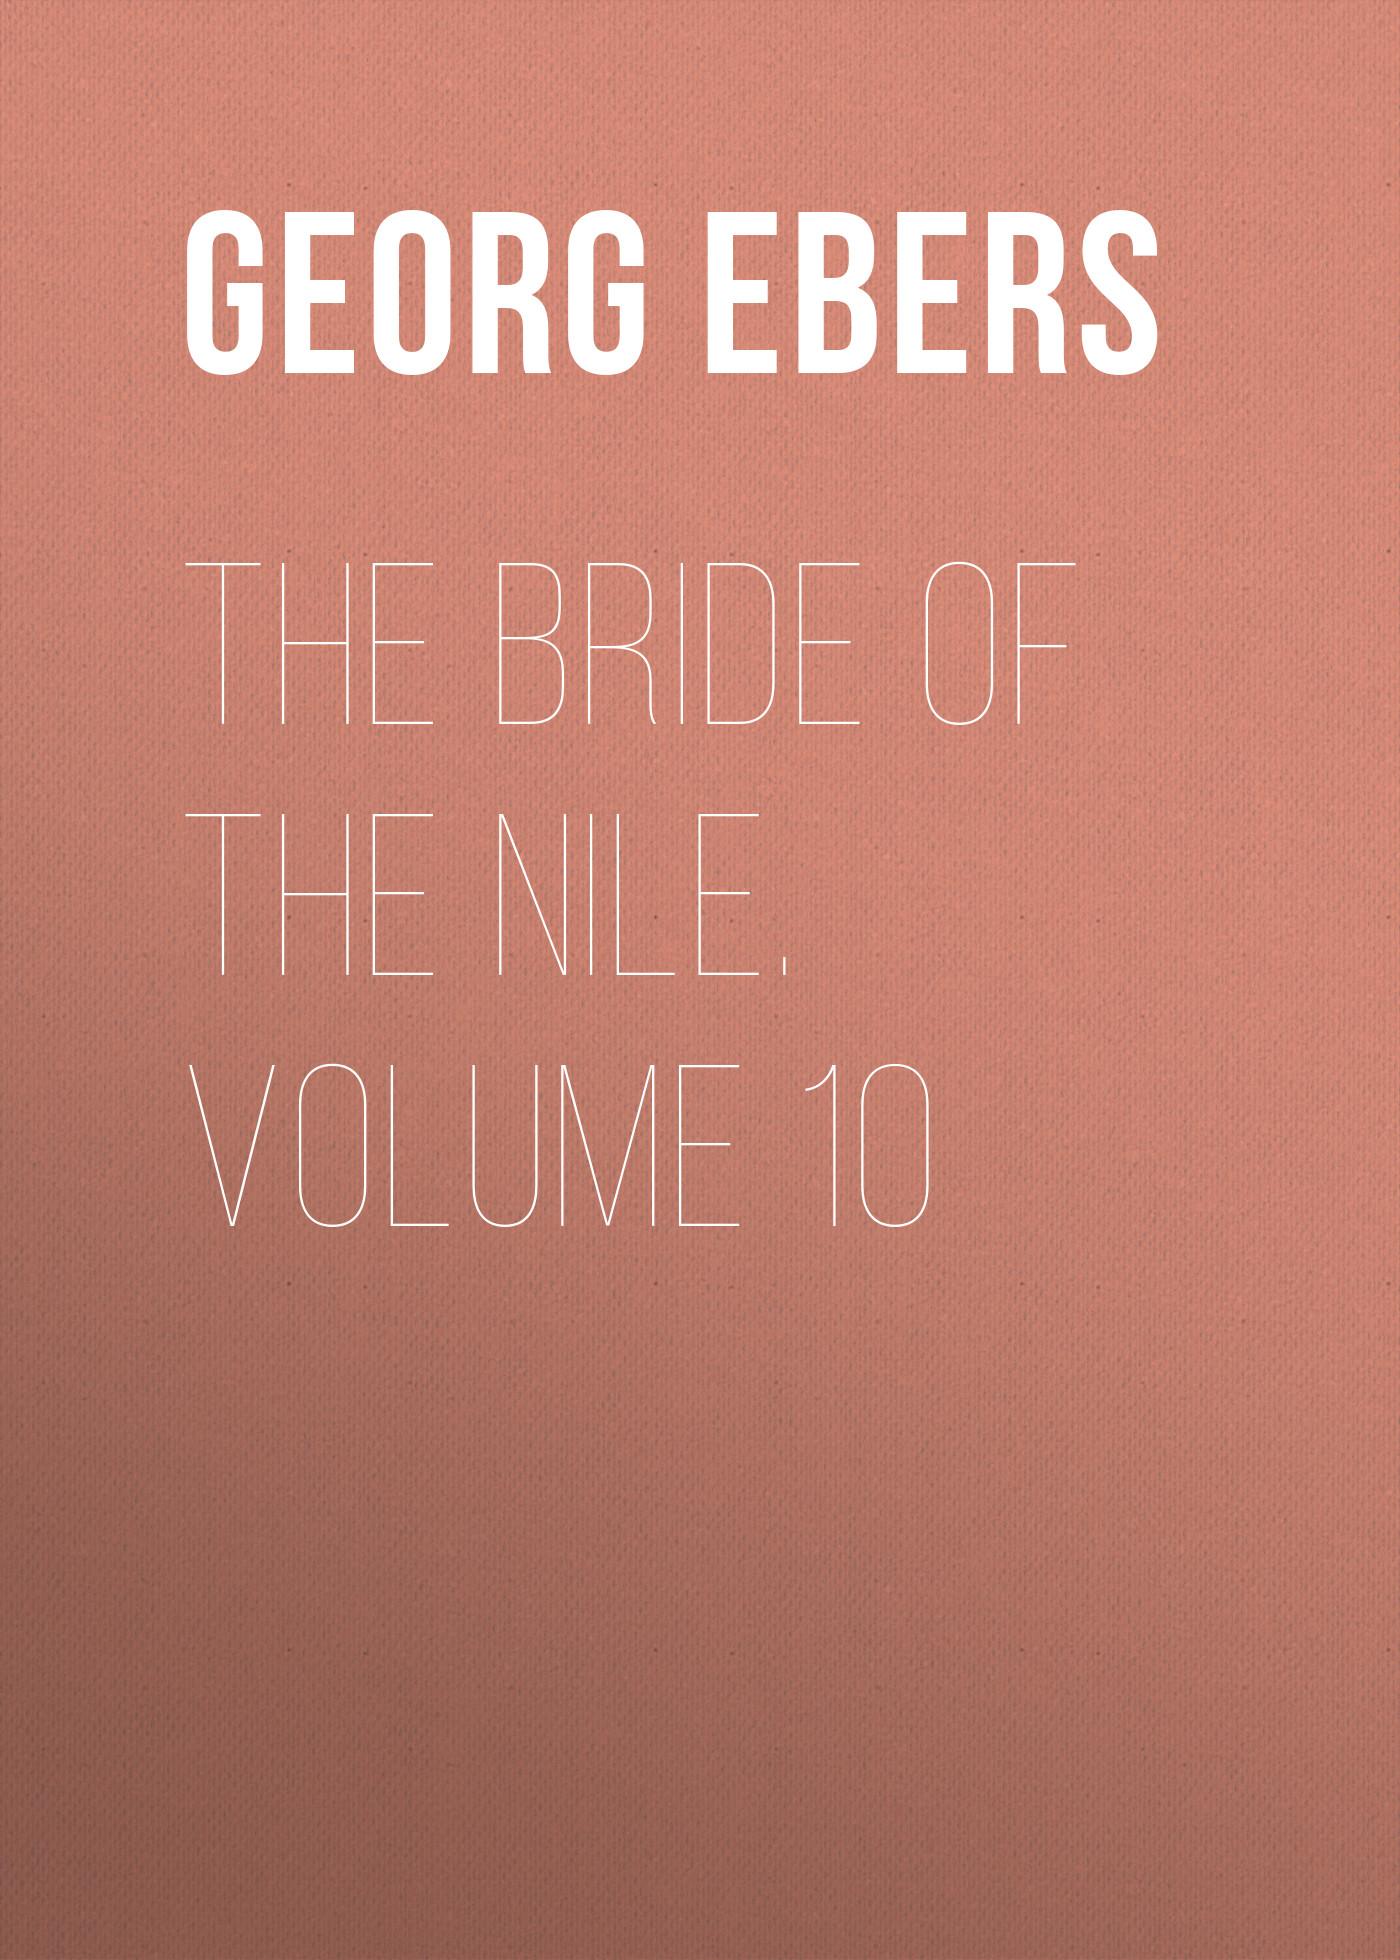 Georg Ebers The Bride of the Nile. Volume 10 gervinus georg gottfried the art of drinking